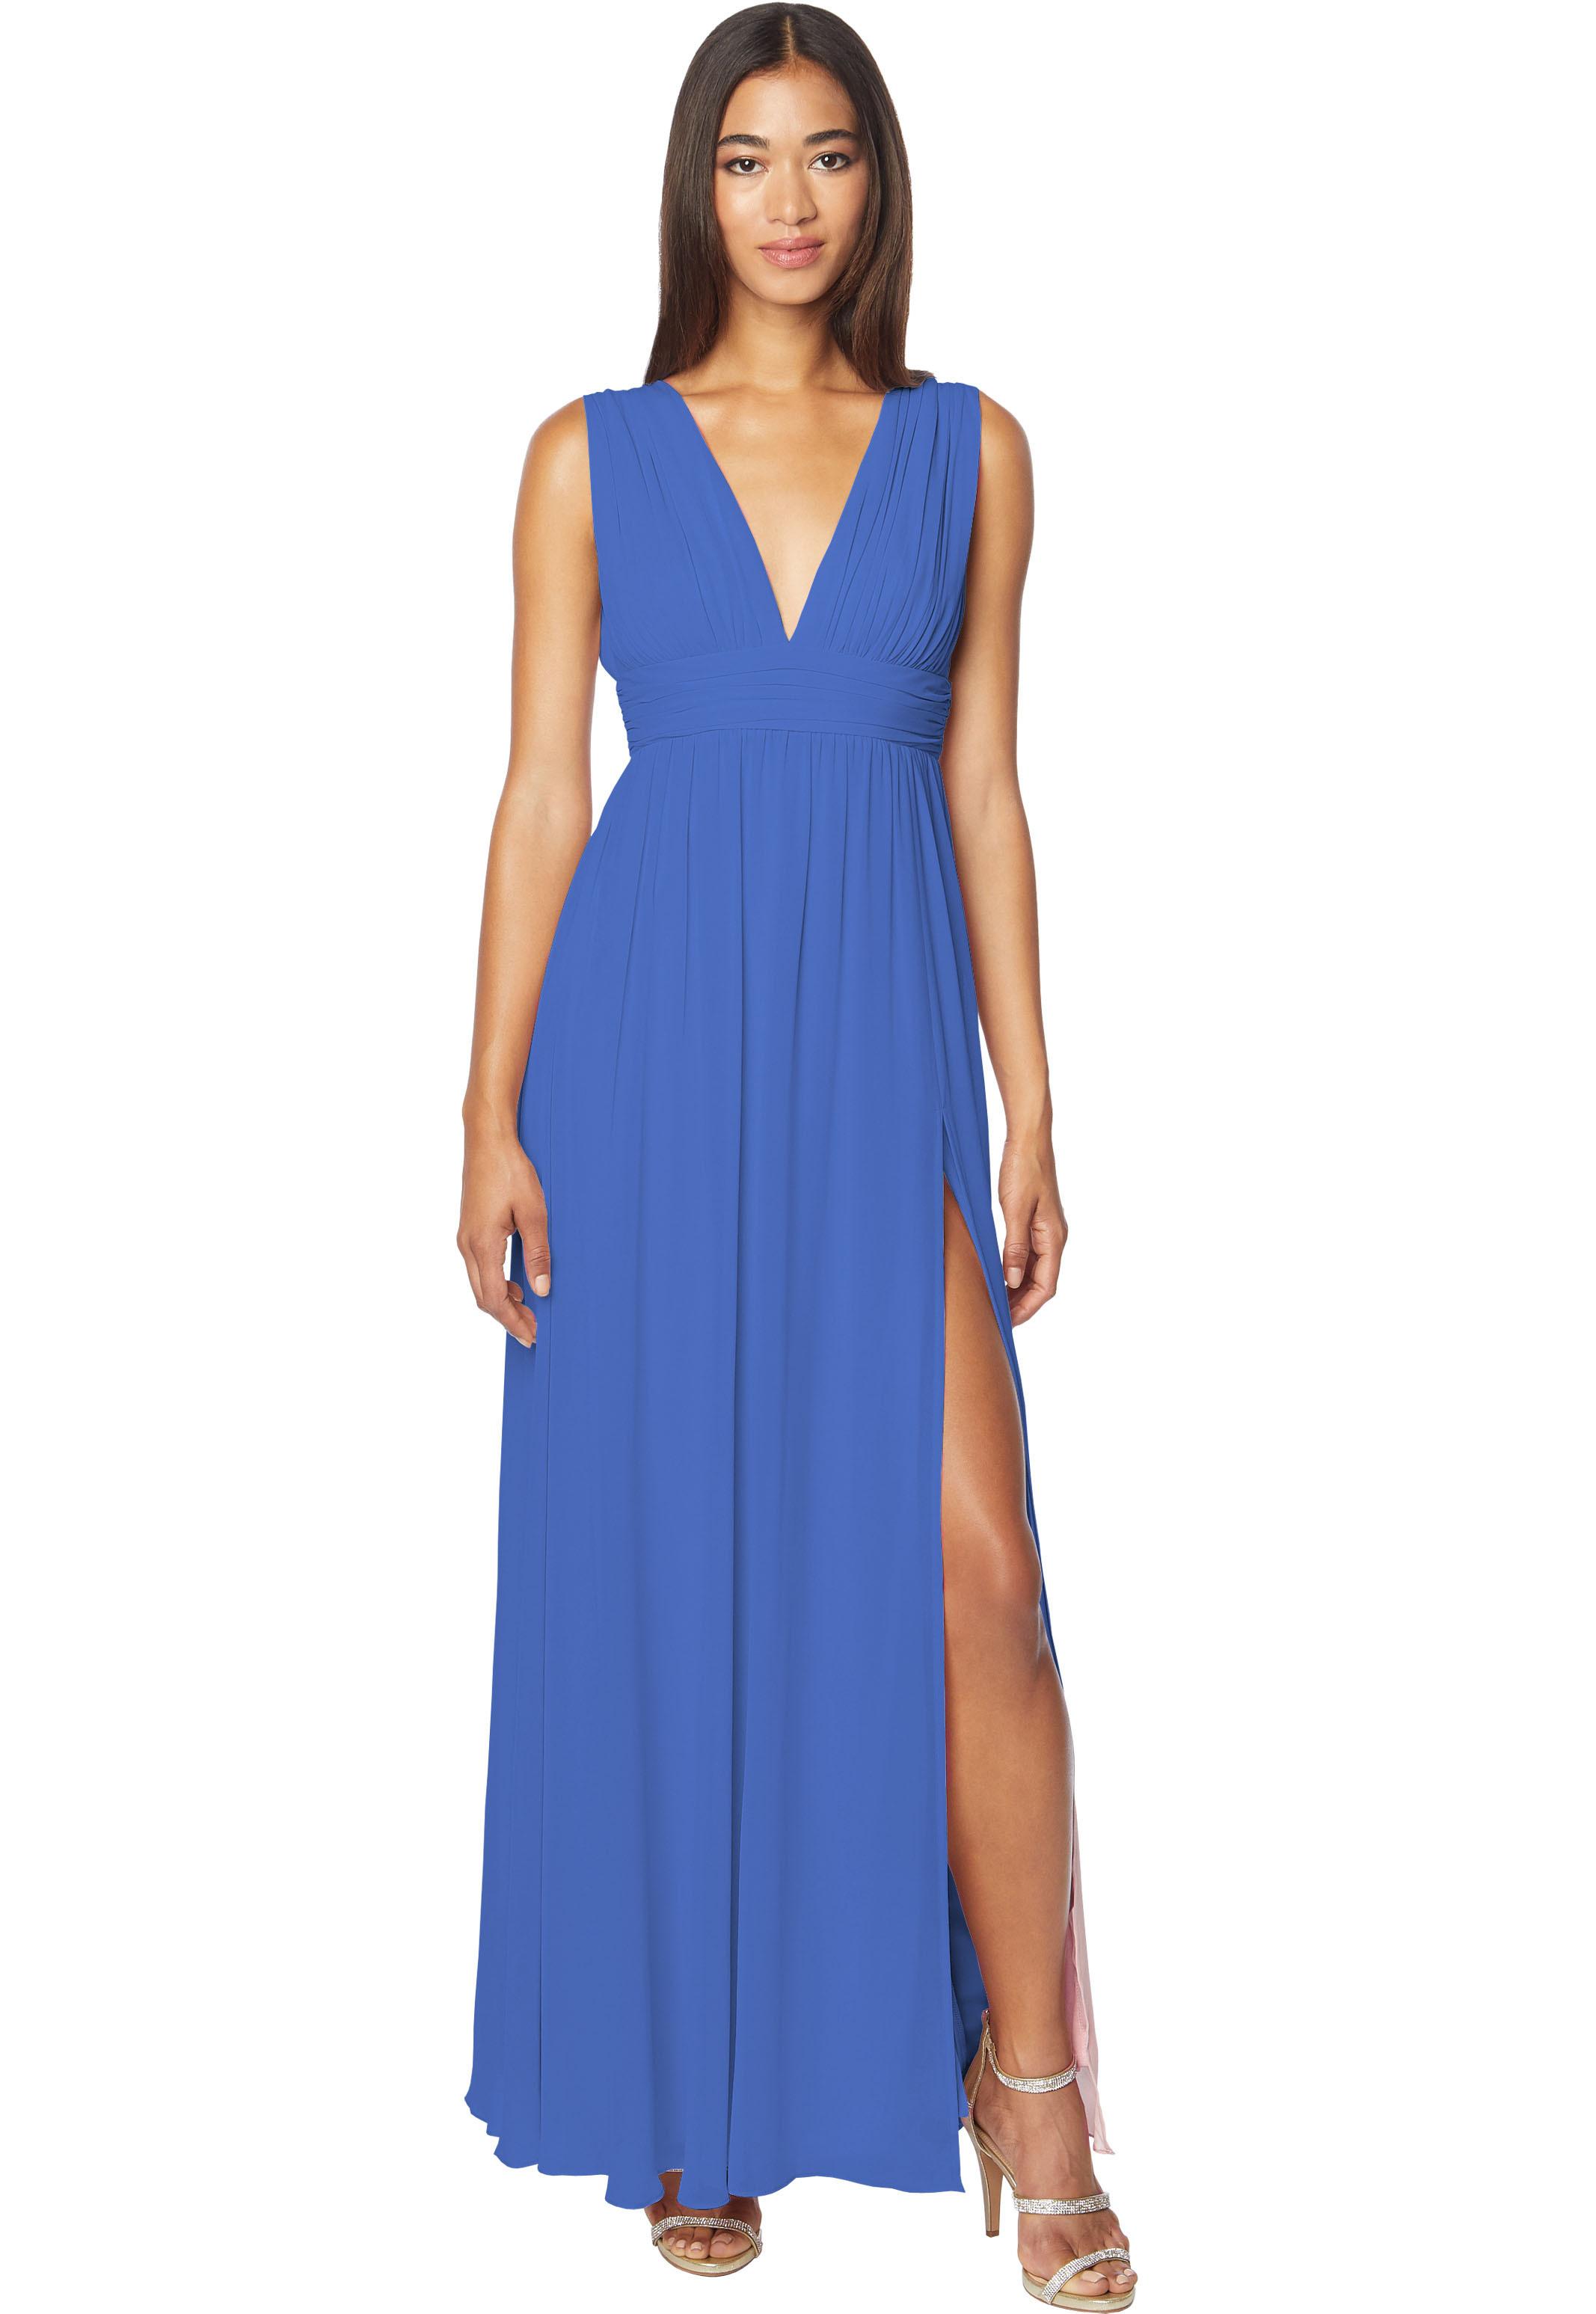 Bill Levkoff HORIZON Chiffon Sleeveless A-line gown, $178.00 Front